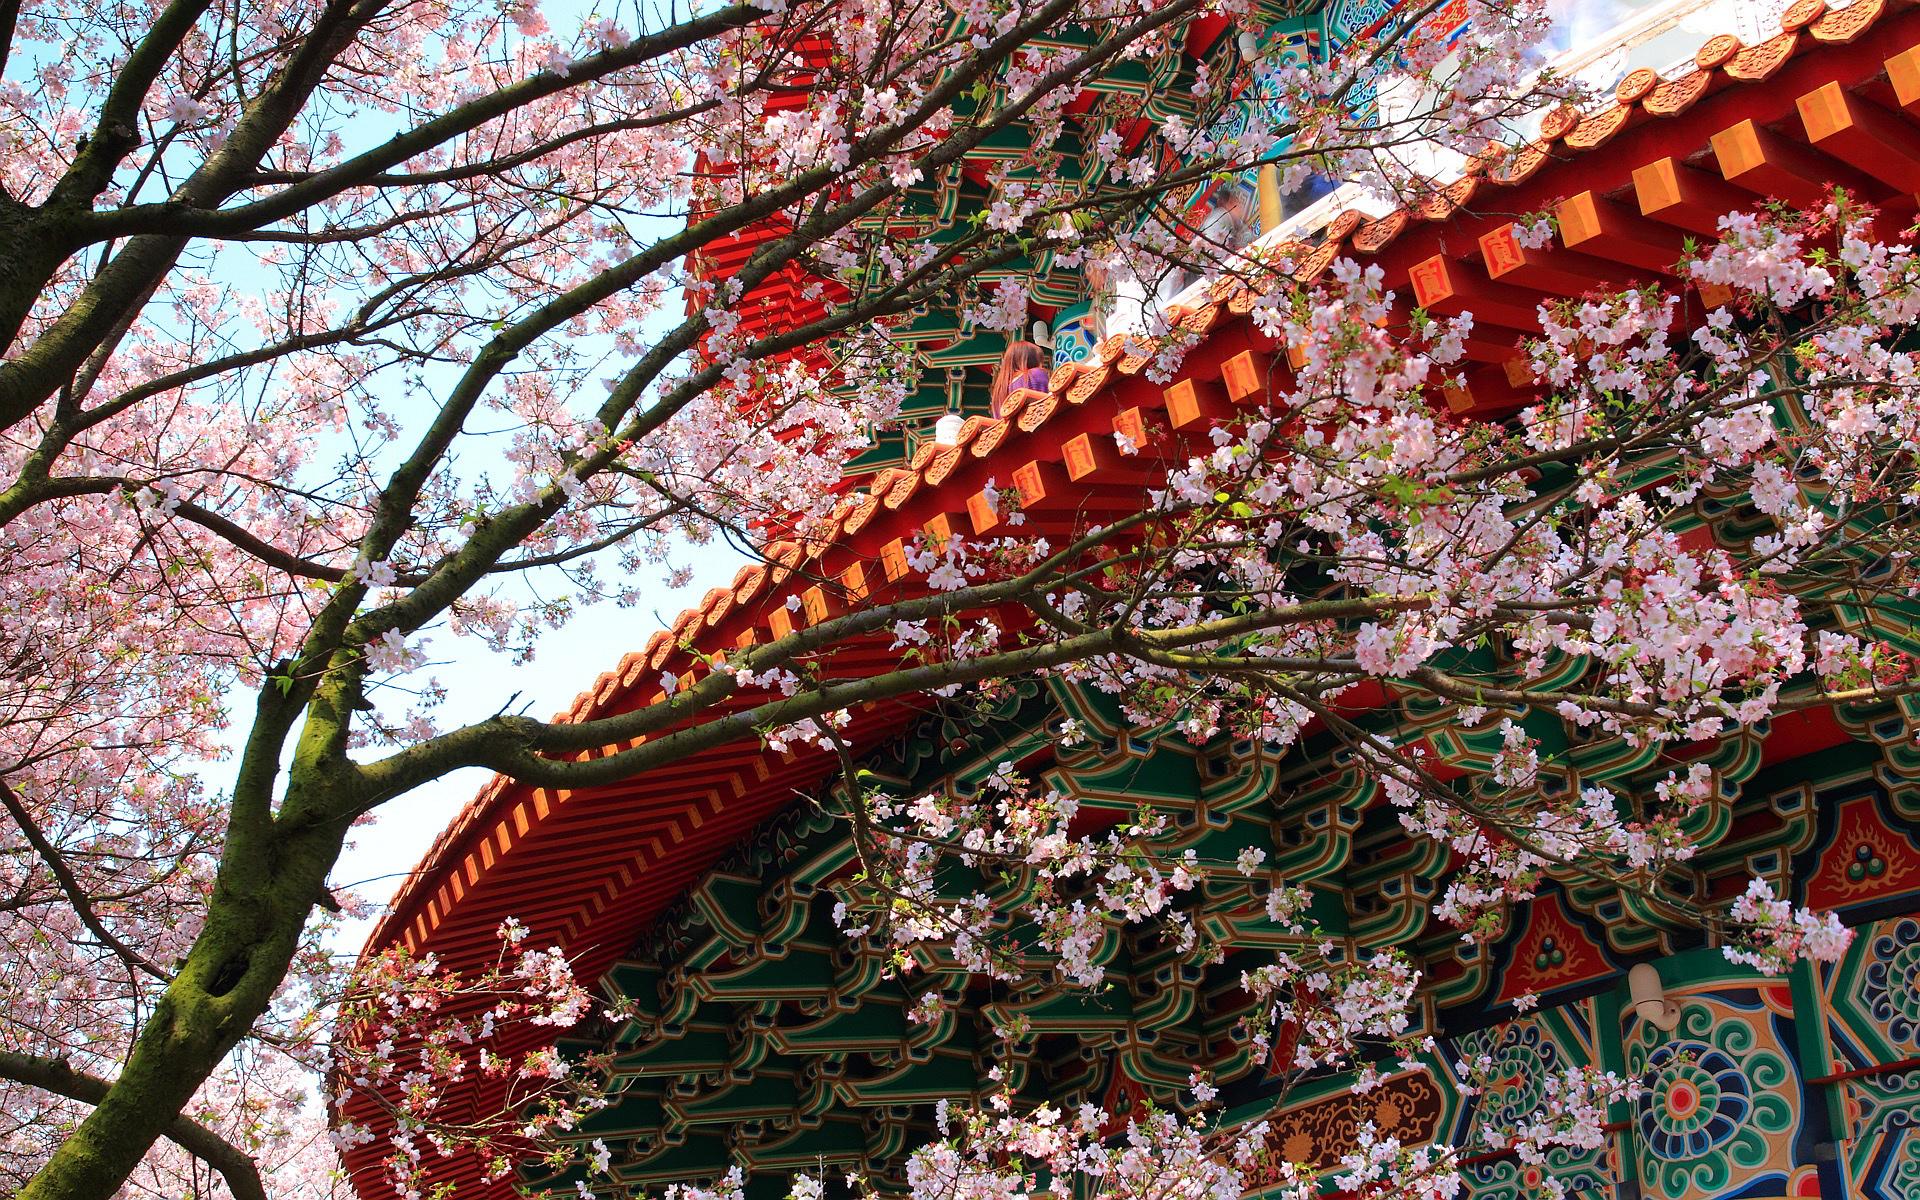 3d Blossoms Live Wallpaper Temple Cherry Blossoms Hd Desktop Wallpapers 4k Hd